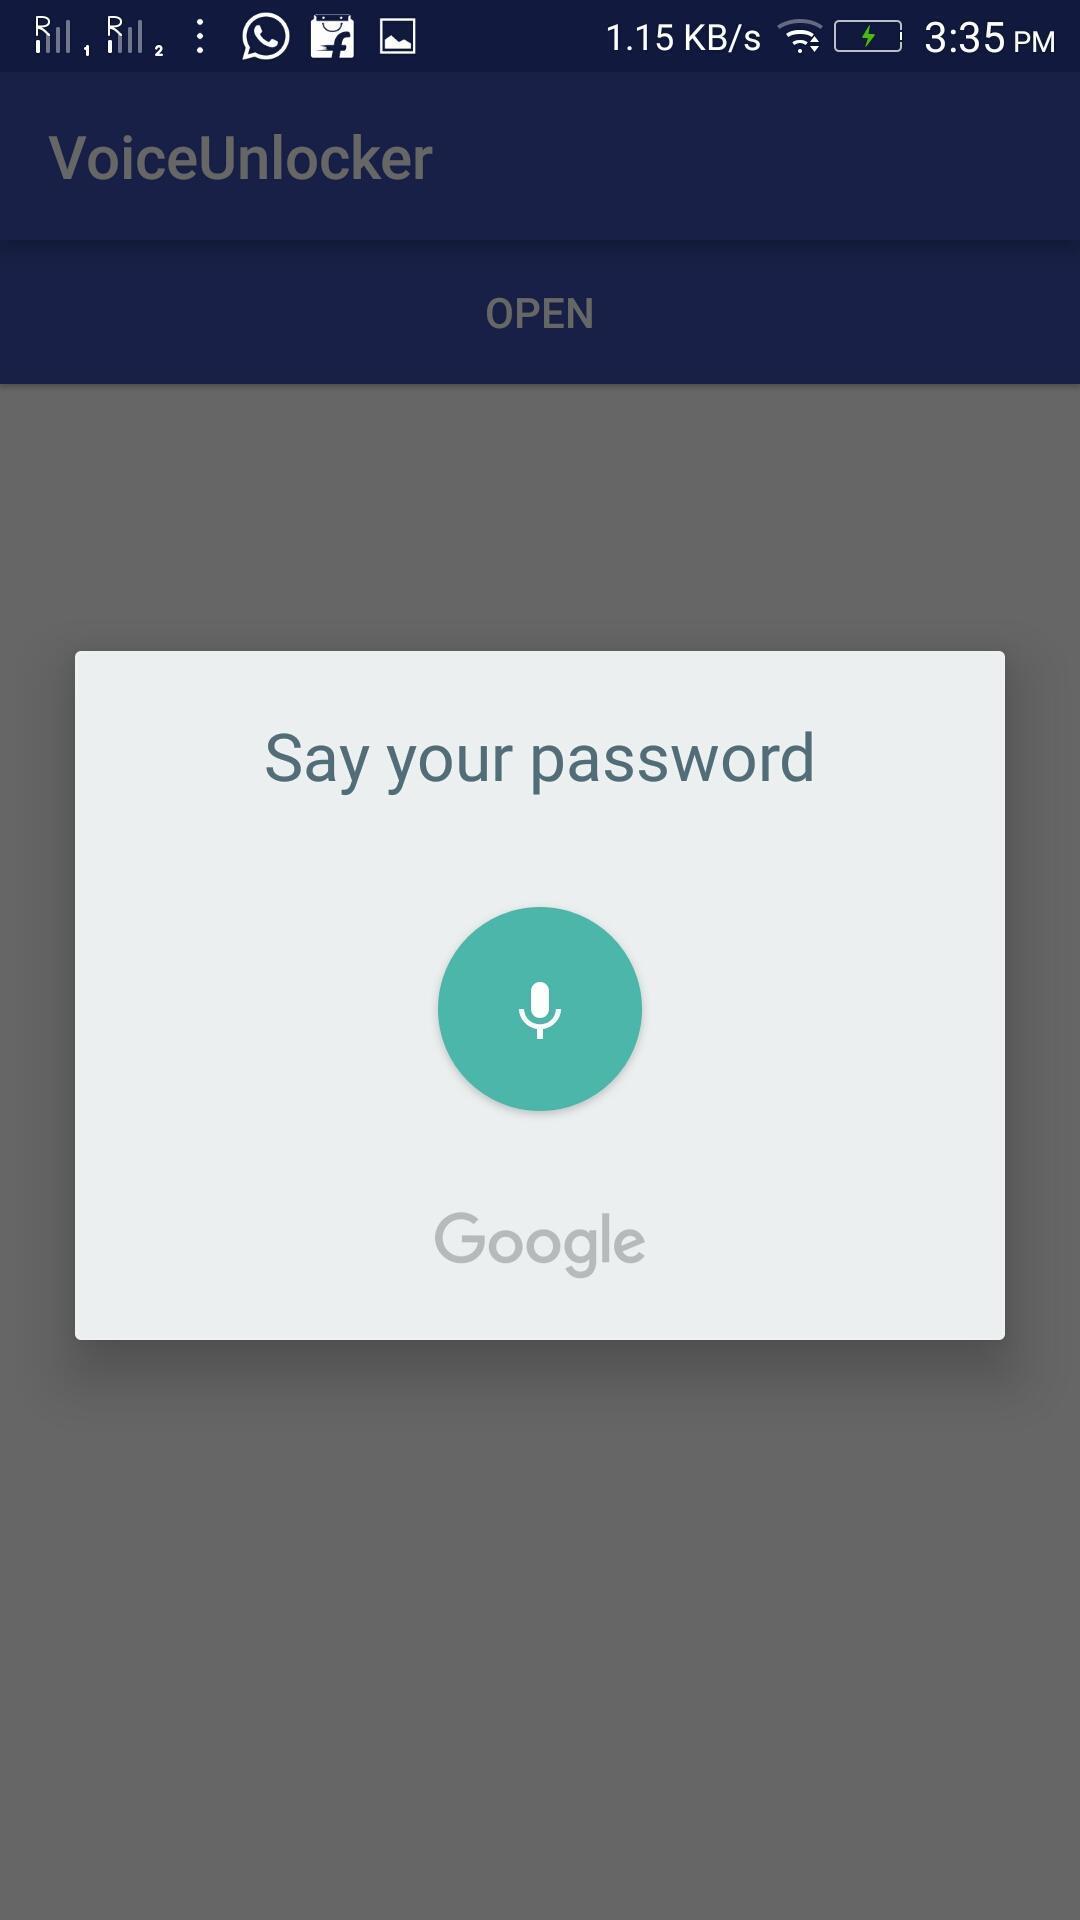 Voice Unlocker Lock Screen screenshot 3